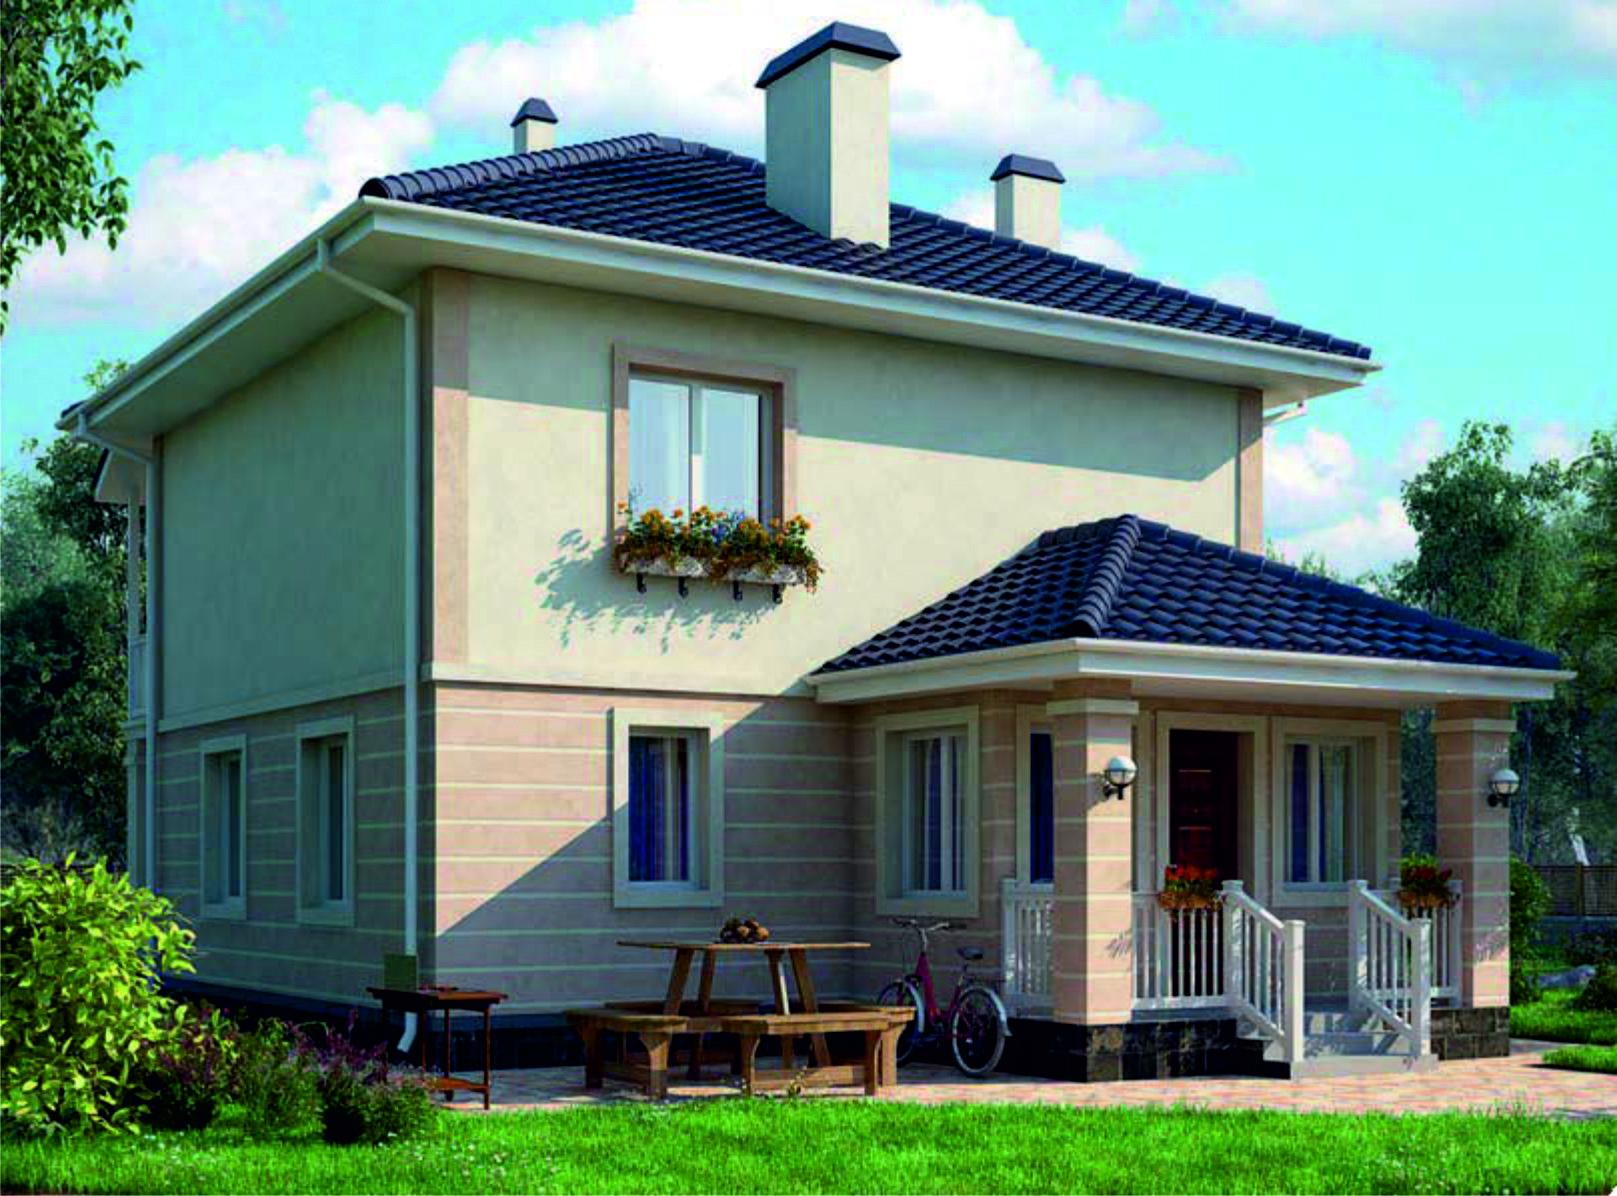 проект дома из газобетона JB-2075 строительство под ключ за 24900 р./м2 <br>итого 1 904 850 руб.  рублей